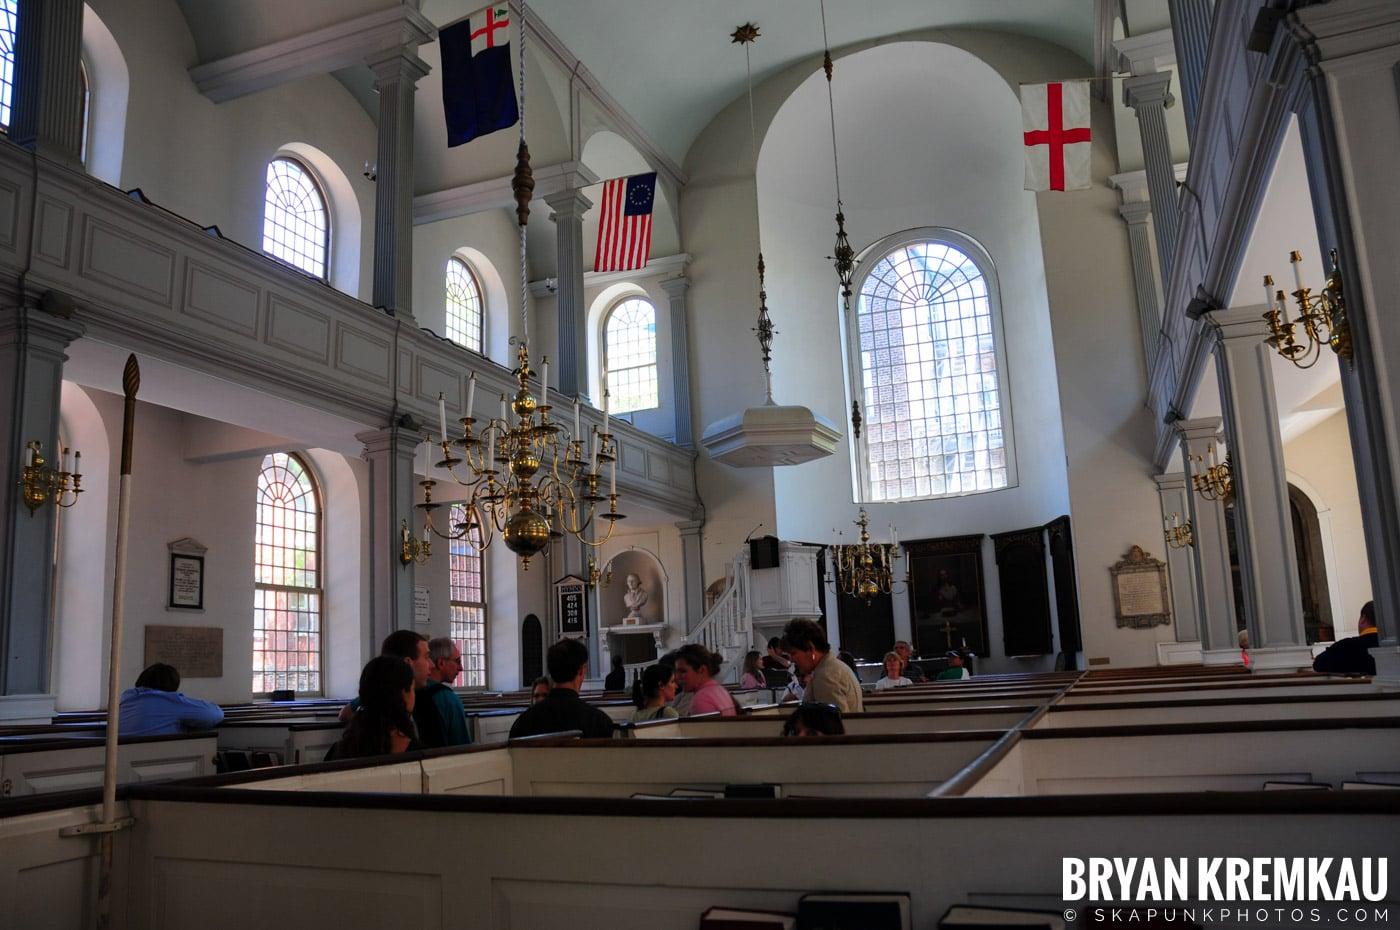 Memorial Day Weekend Trip to Boston - 5.25.08 (14)